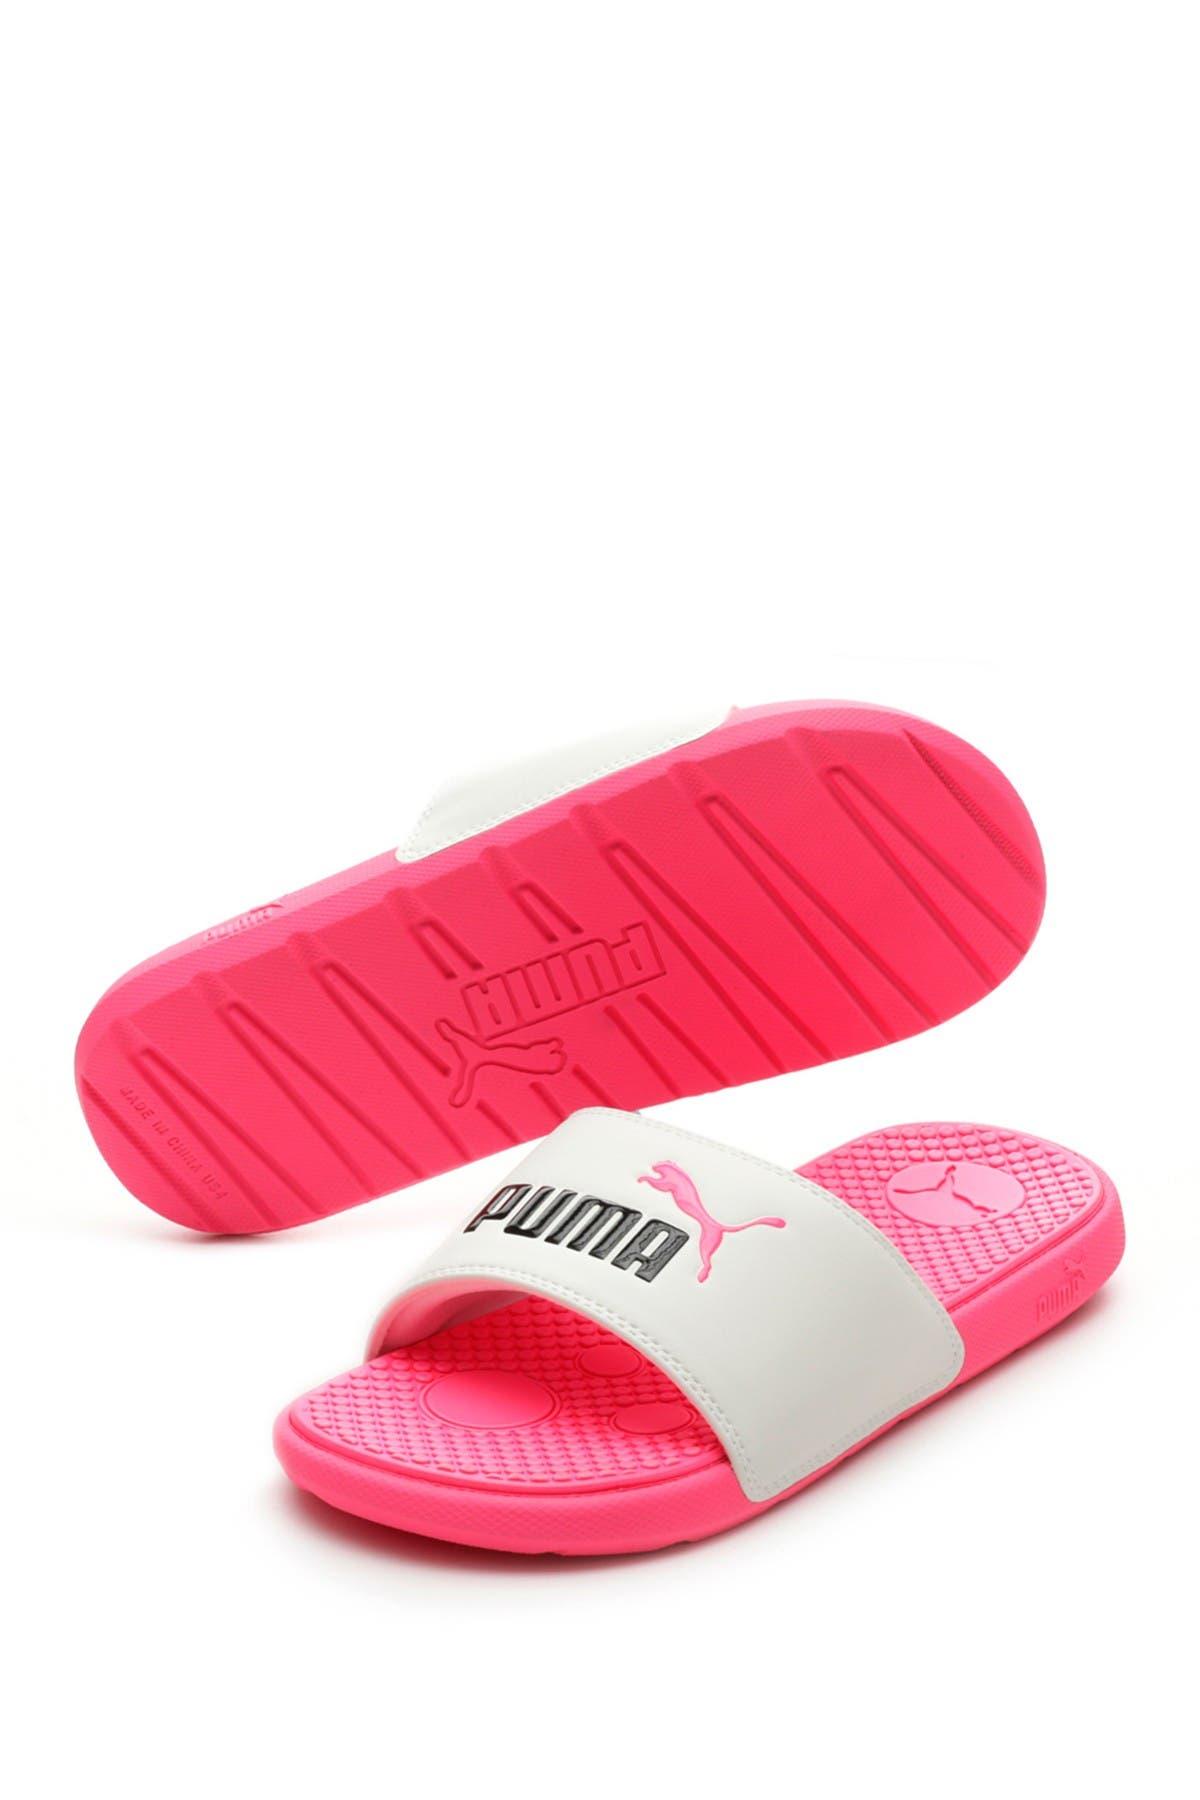 Image of PUMA Cool Cat Jr Slide Sandal